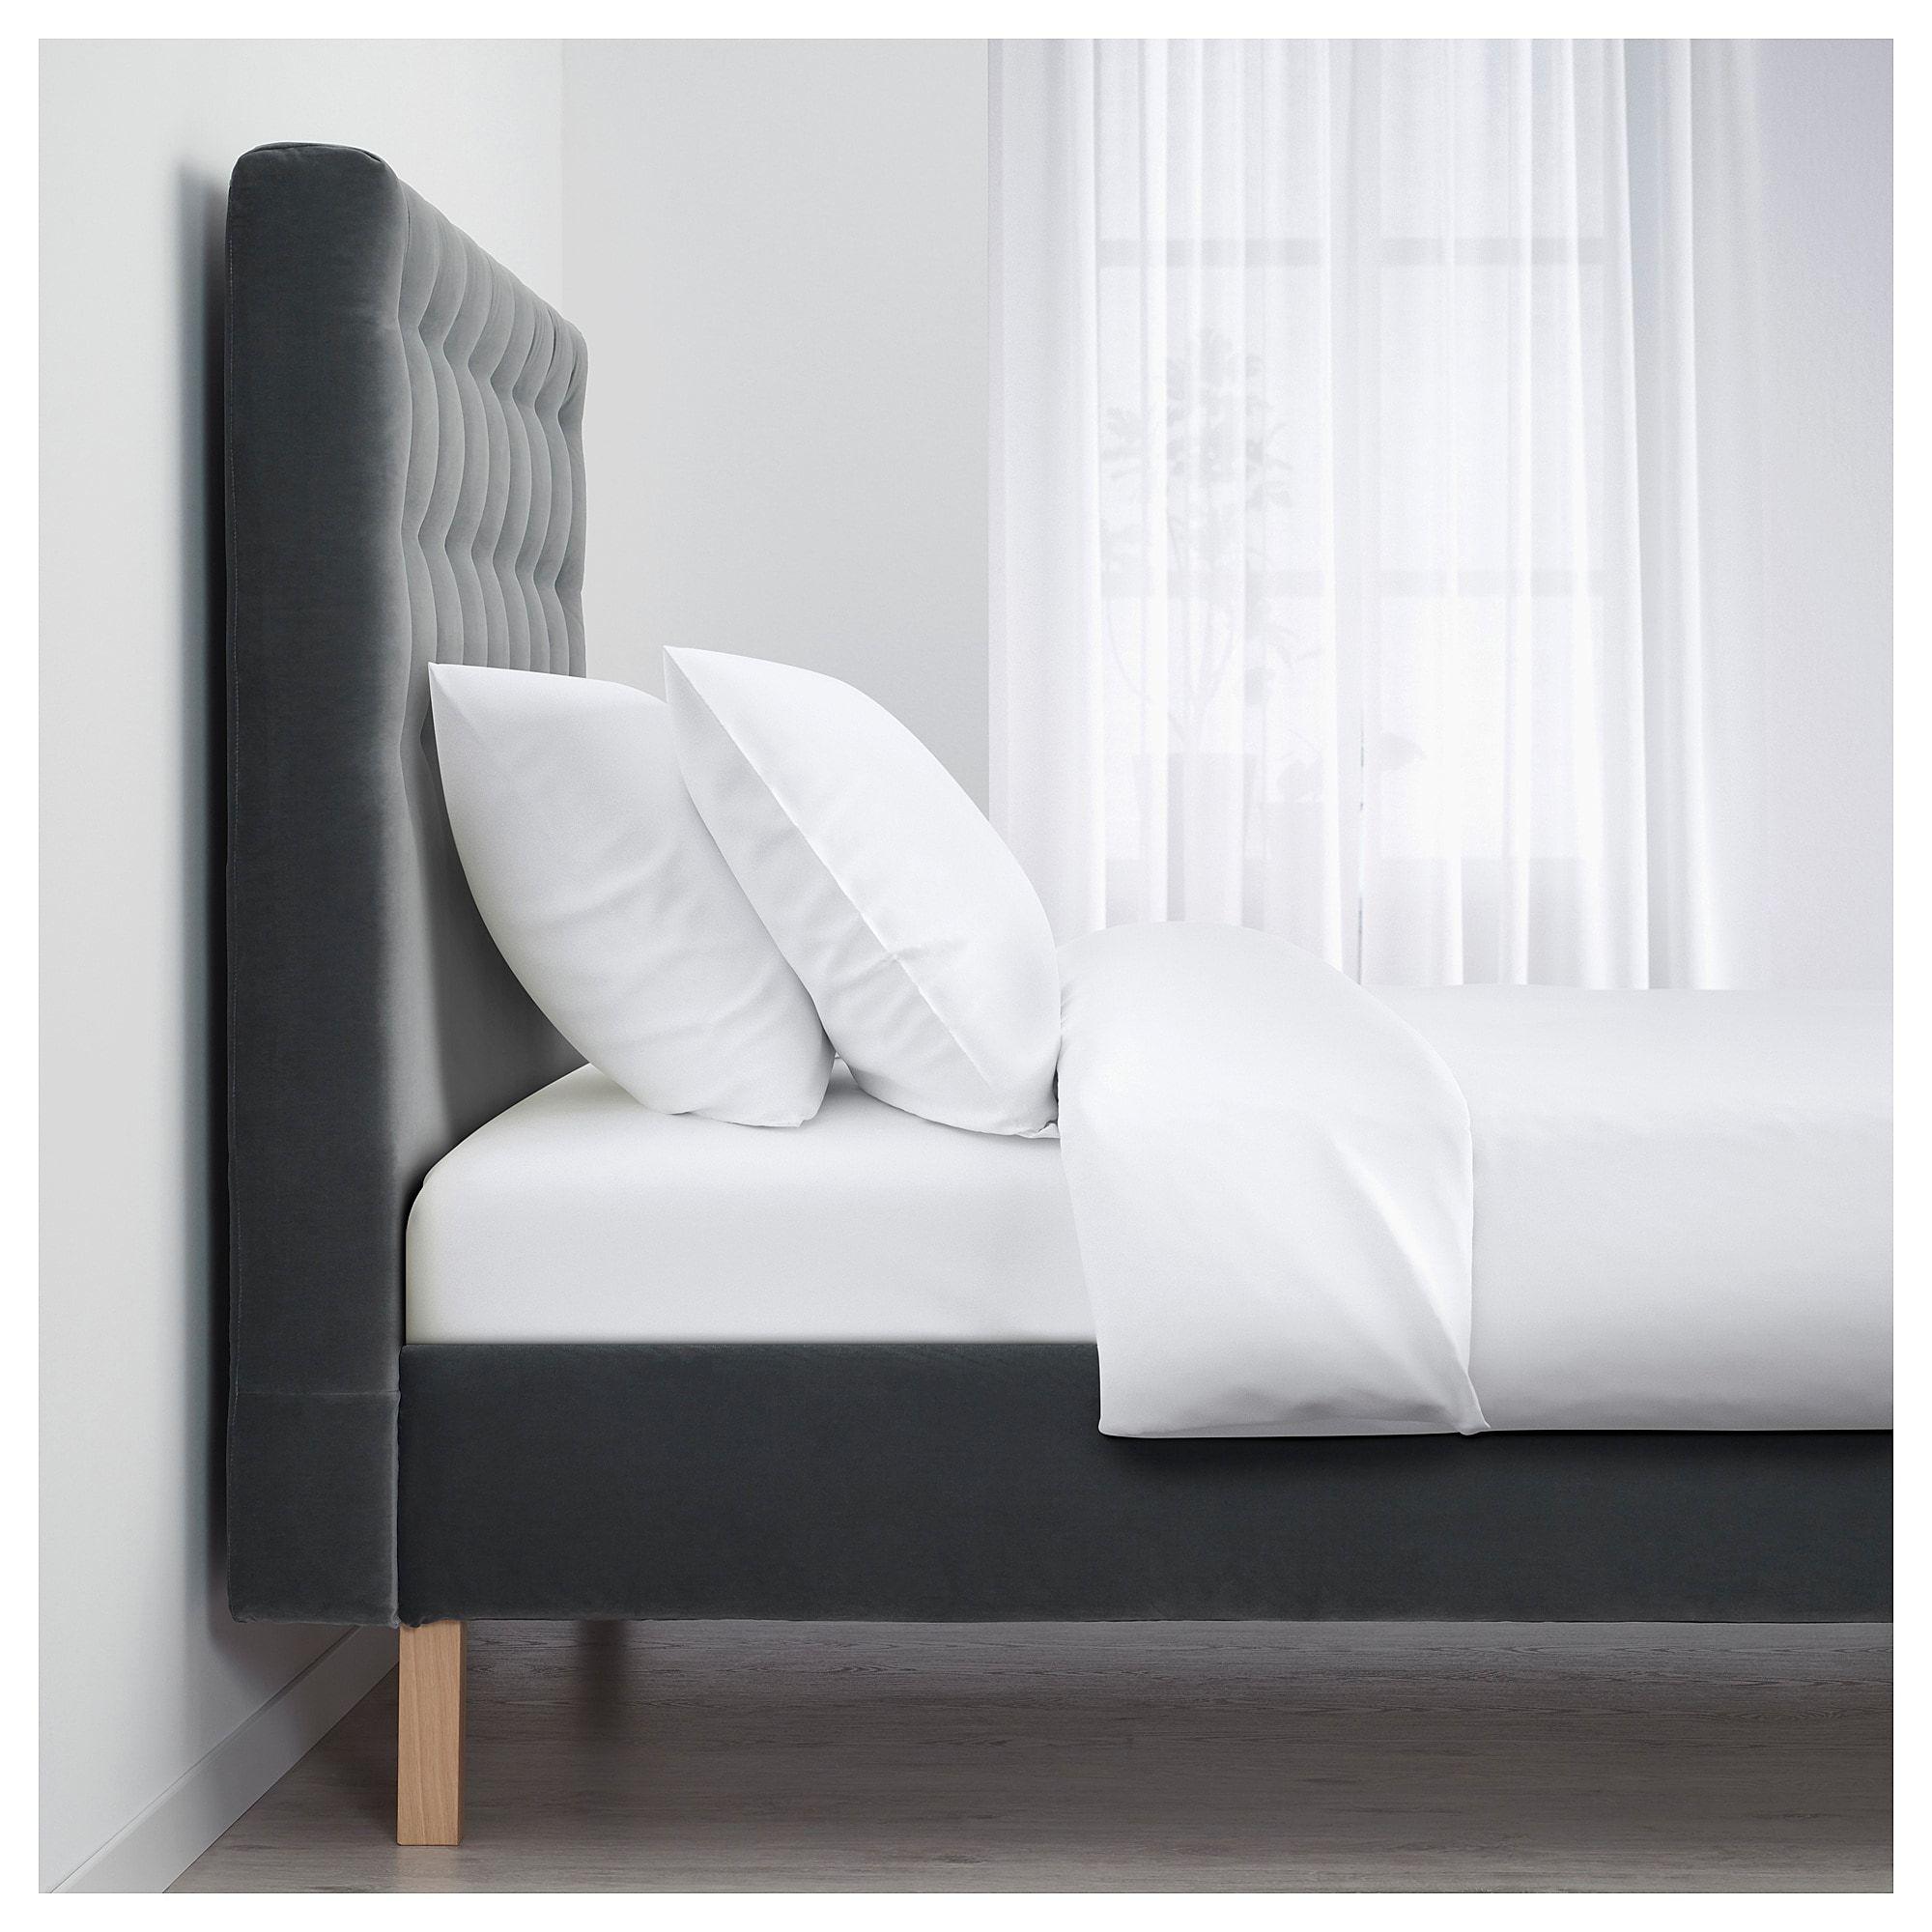 Ikea Kvalfjord Sandbacka Dark Gray Luroy Bed Frame Bed Frame